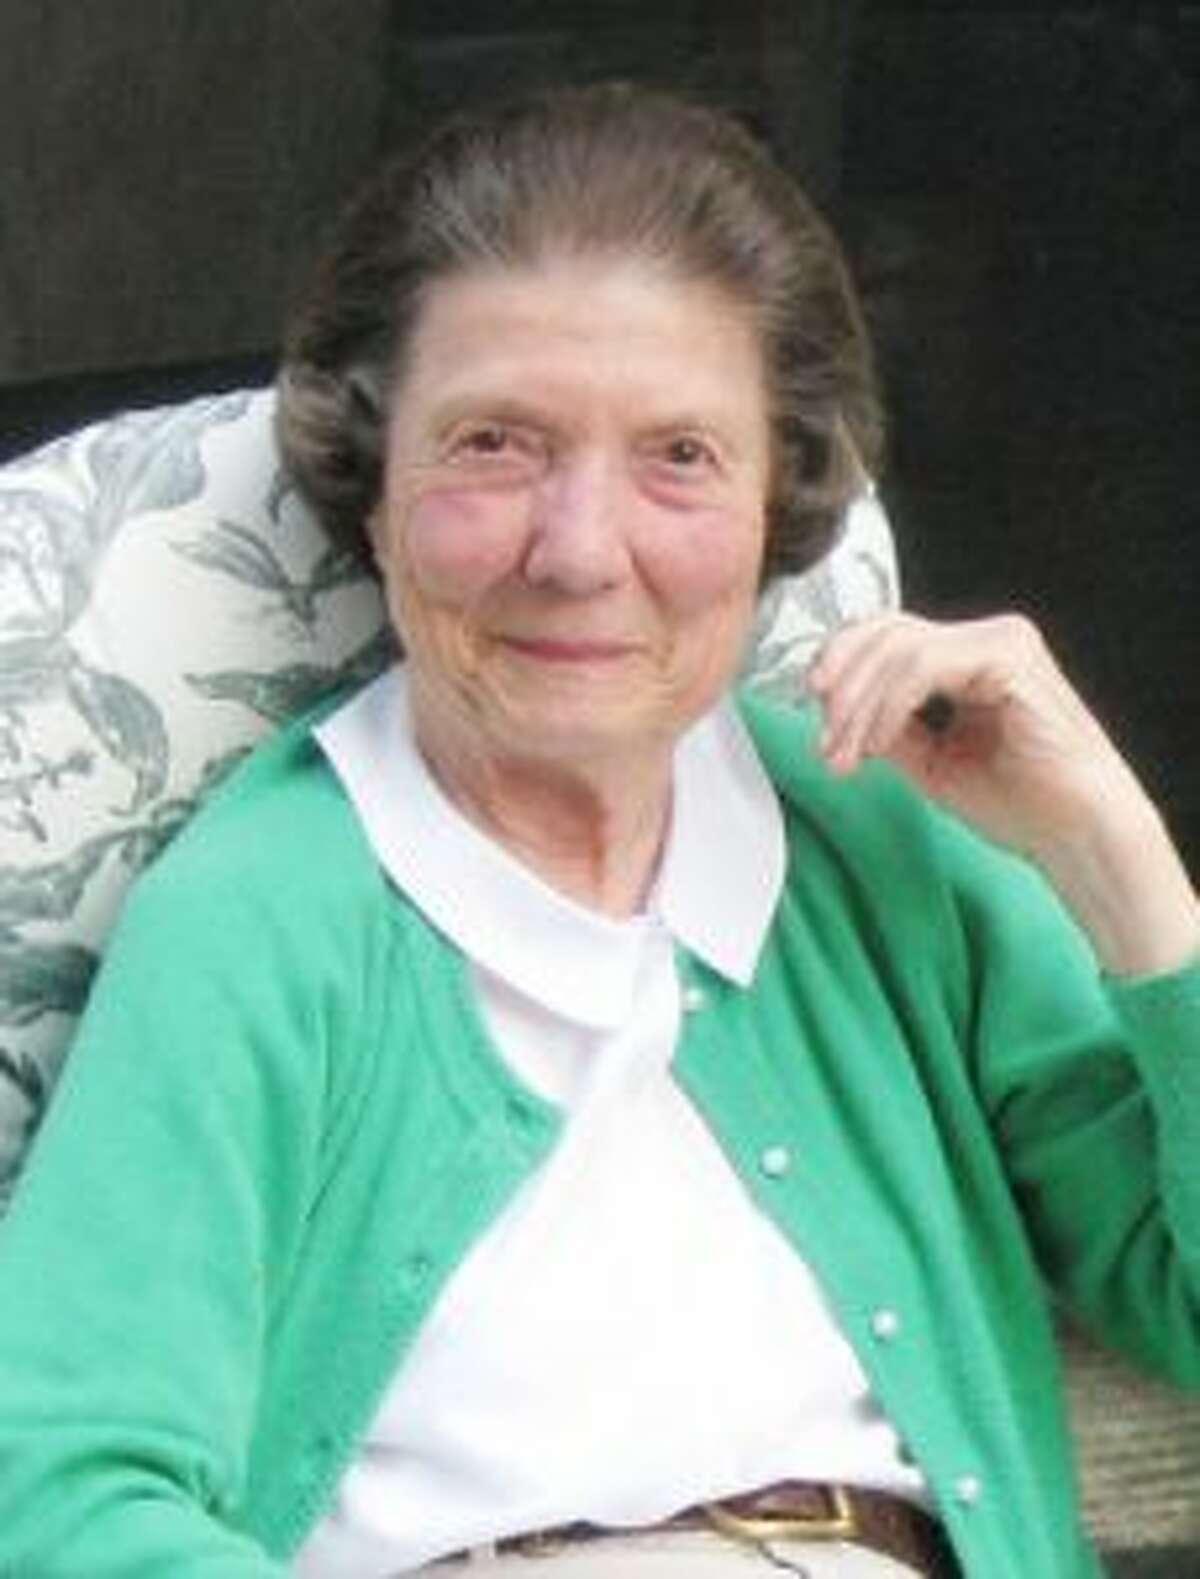 Marcia Hartley Bates